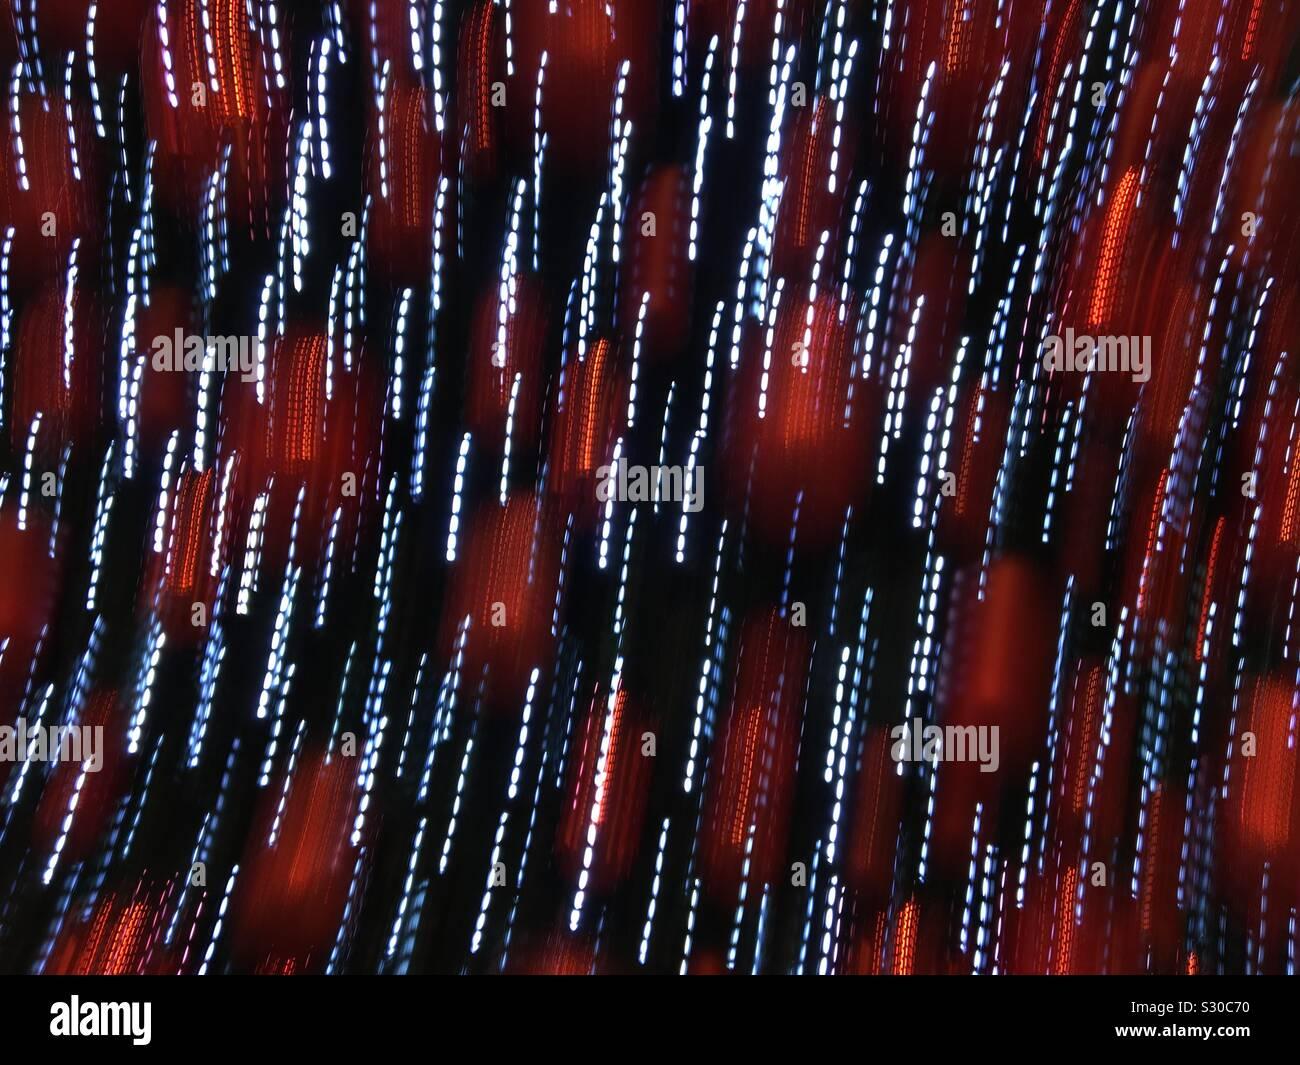 Xmas Motion Effect Wallpaper Made Of Xmas Decorative